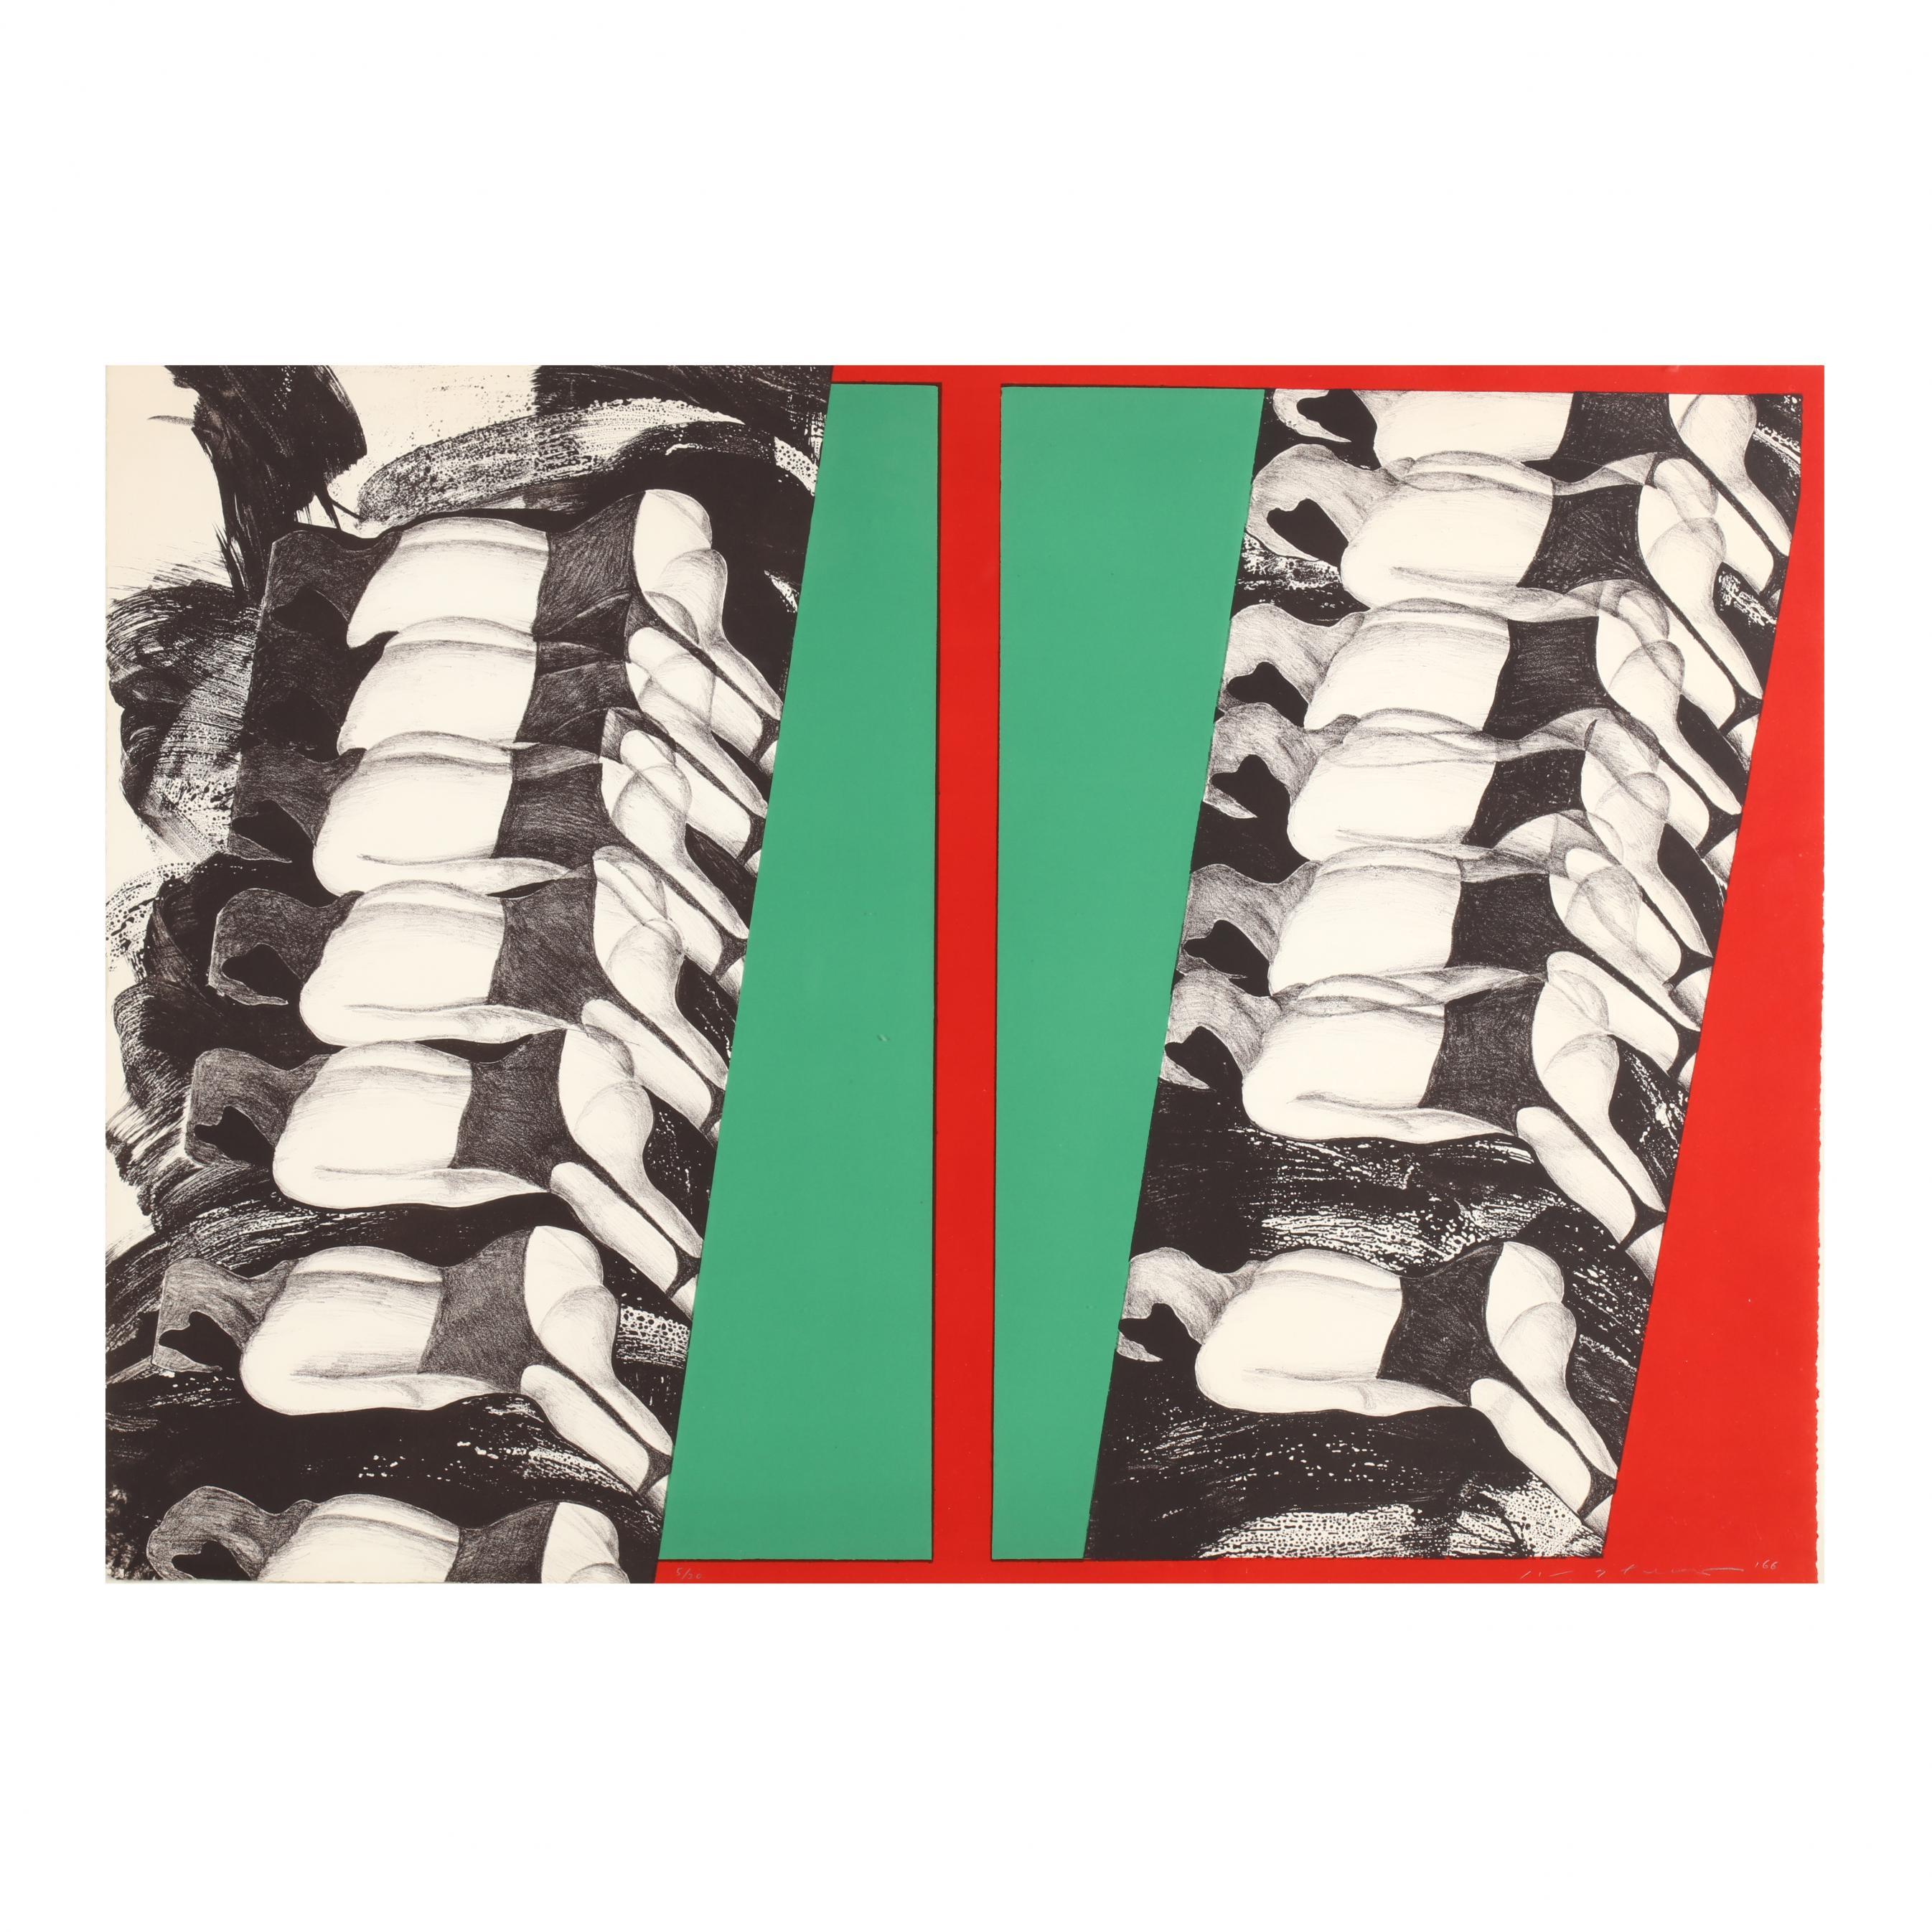 masuo-ikeda-japanese-1934-1997-i-view-of-love-a-i